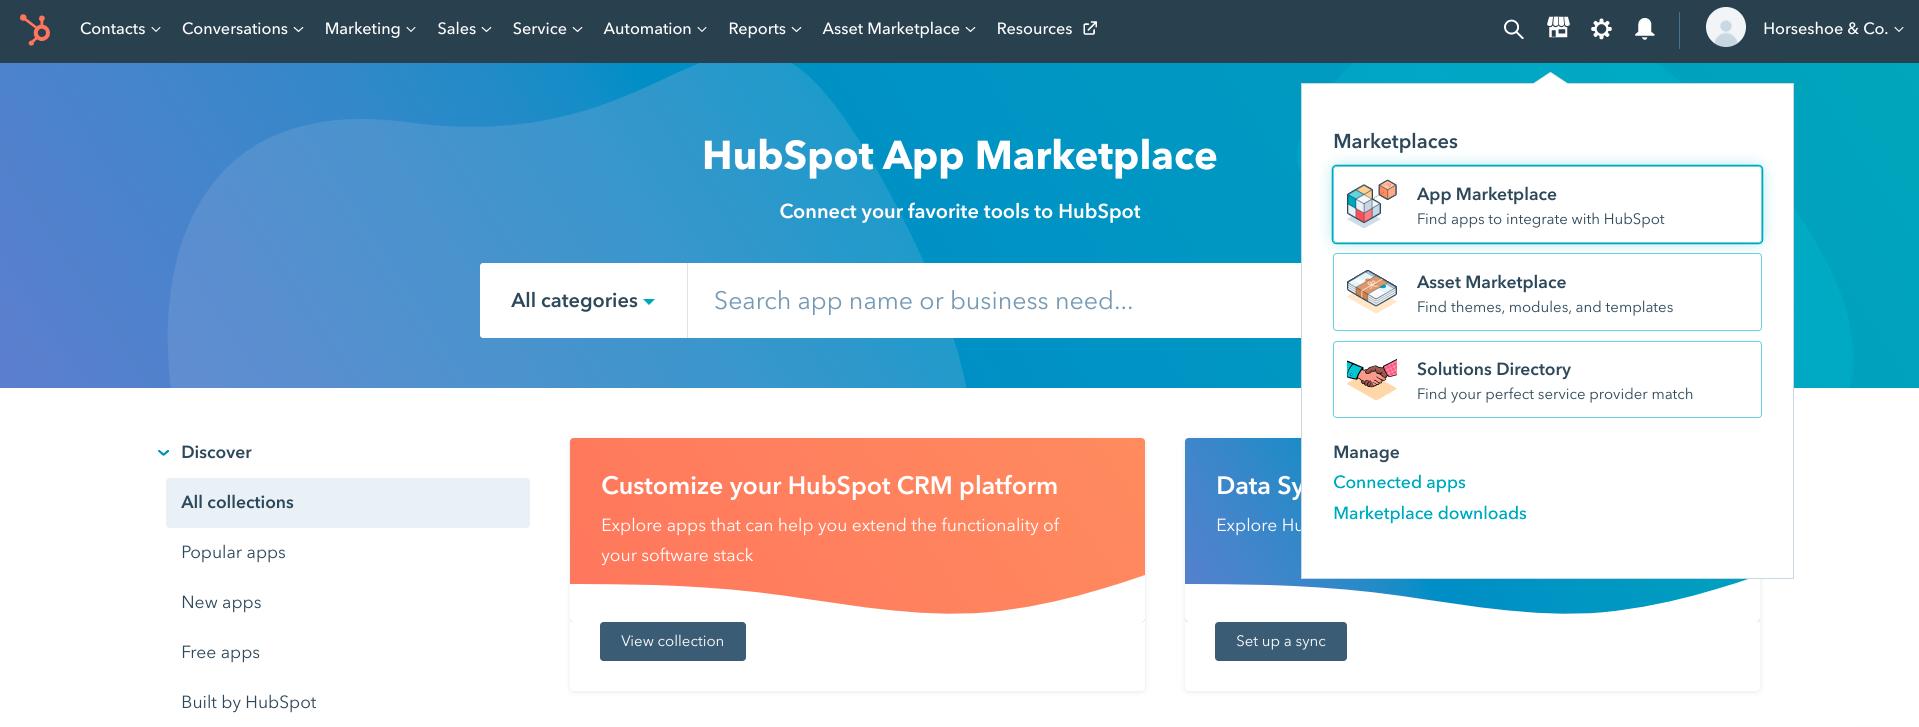 The HubSpot app marketplace